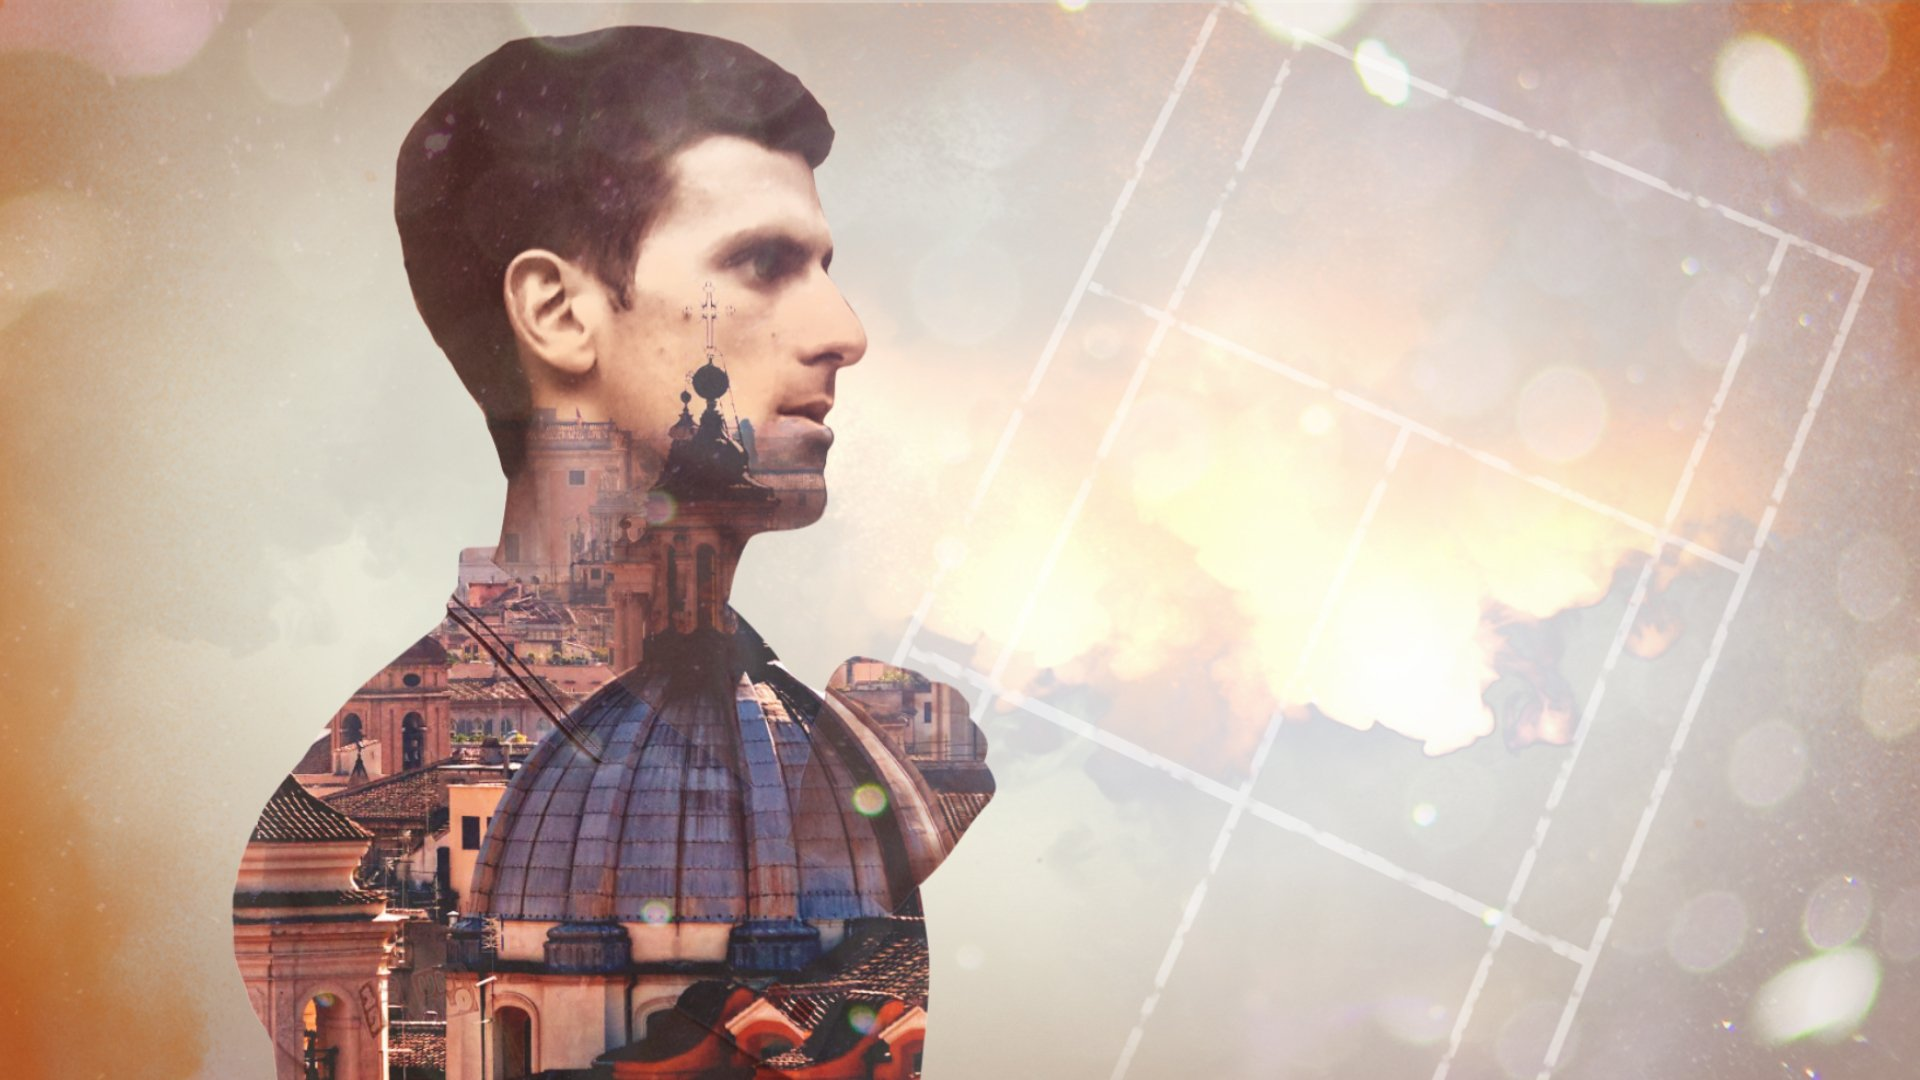 SKY Italy - ATP Master 1000 Roma | TV promo